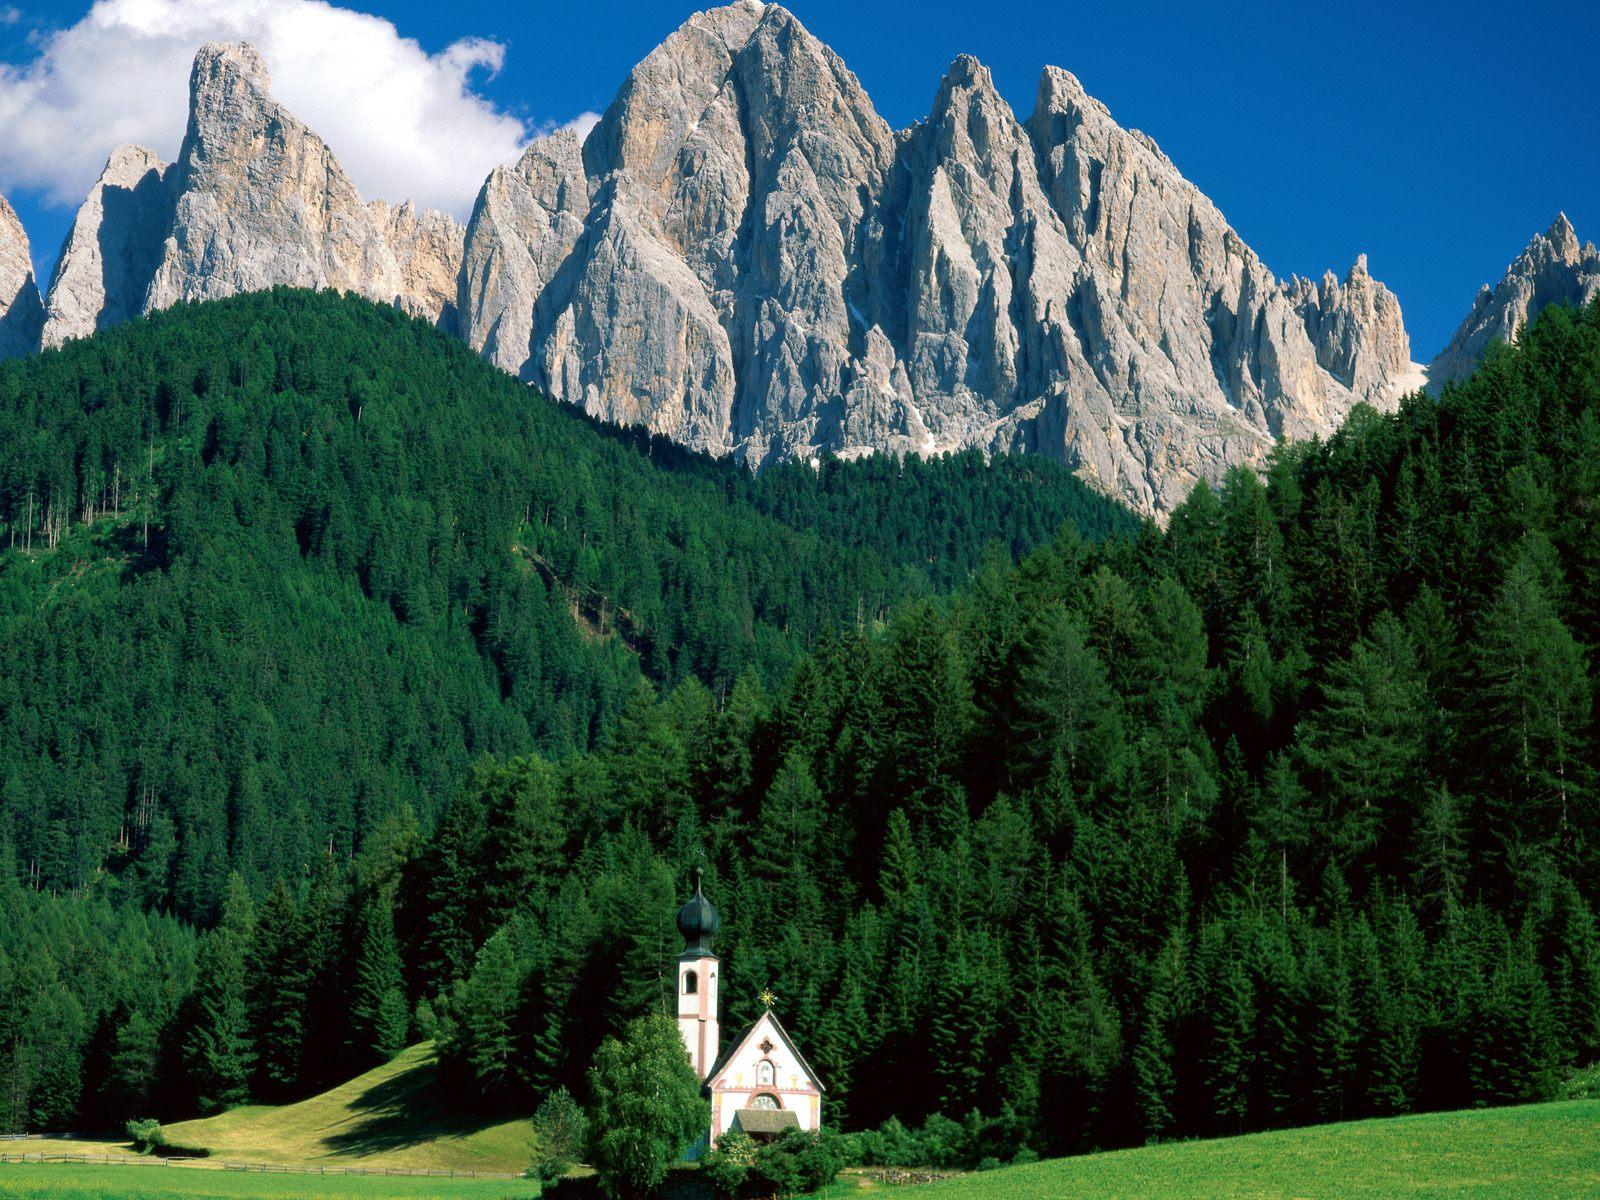 http://2.bp.blogspot.com/-Z1yFzMUkfCY/Tcp3fF1rOwI/AAAAAAAACW8/p1VoNYk1D8w/s1600/Dolomite+Mountains%252C+Italy.jpg